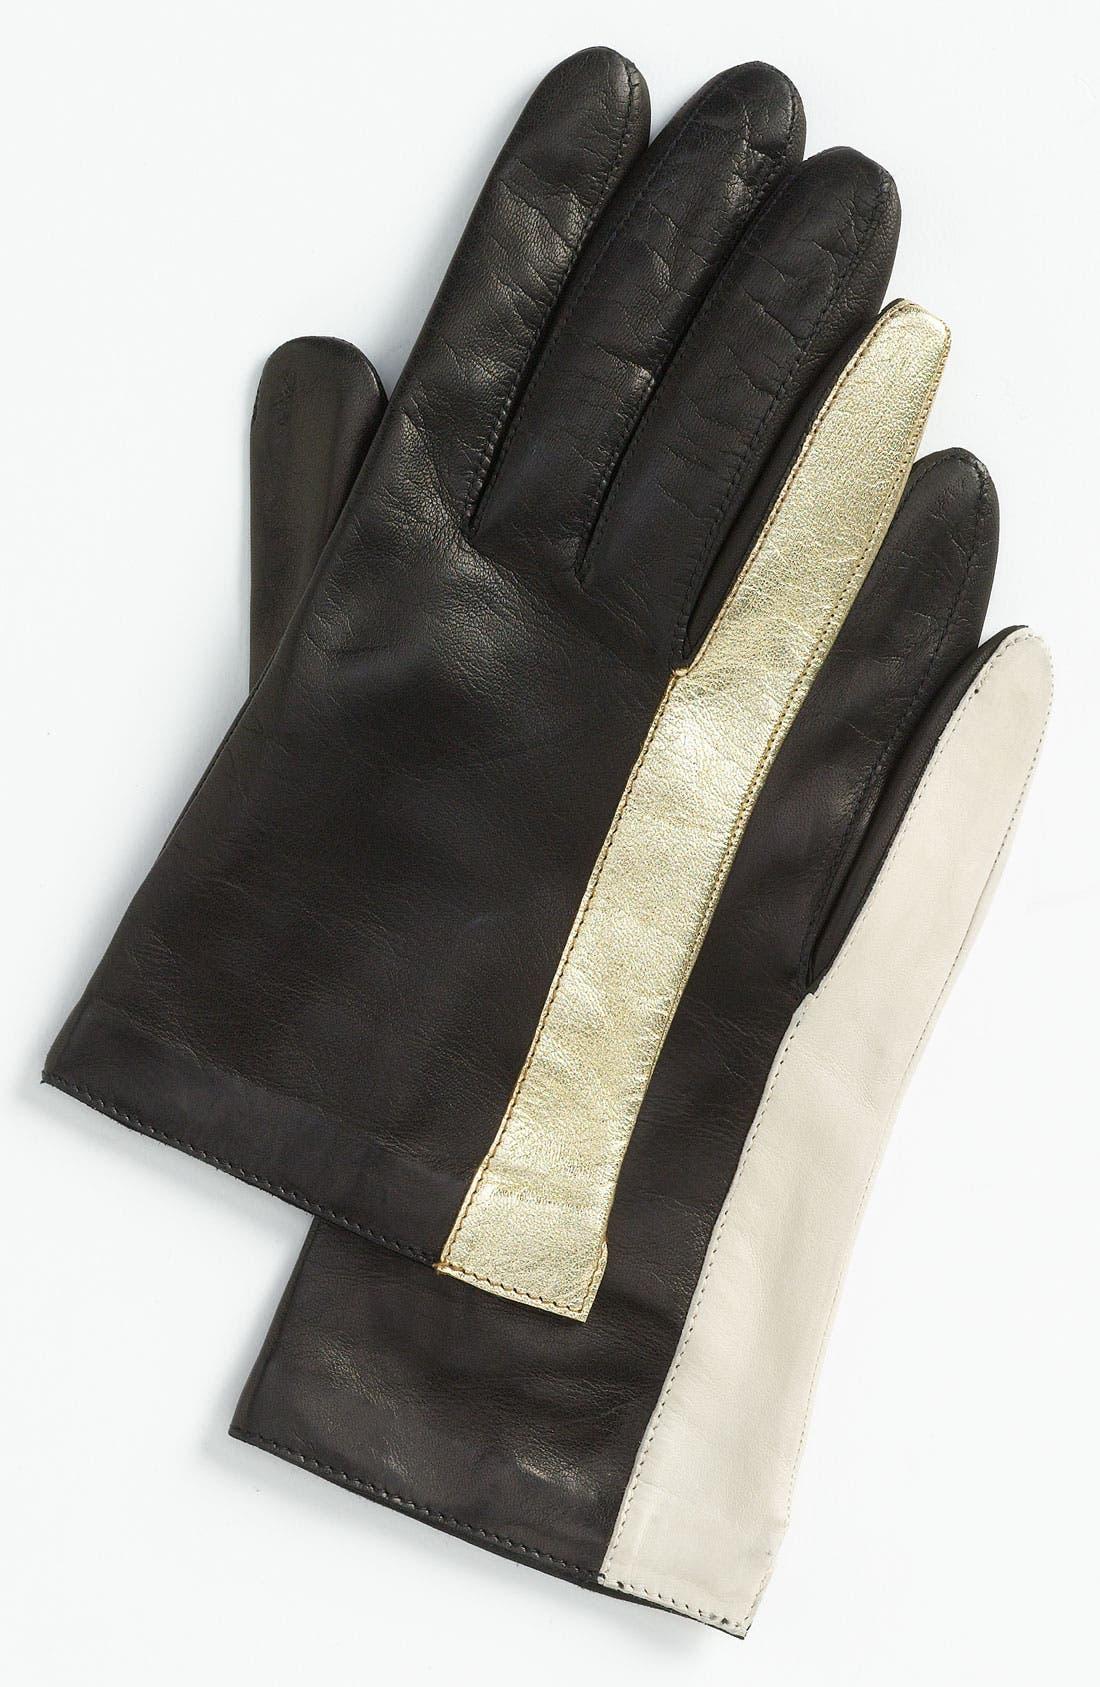 Alternate Image 1 Selected - Diane von Furstenberg Colorblock Leather Gloves